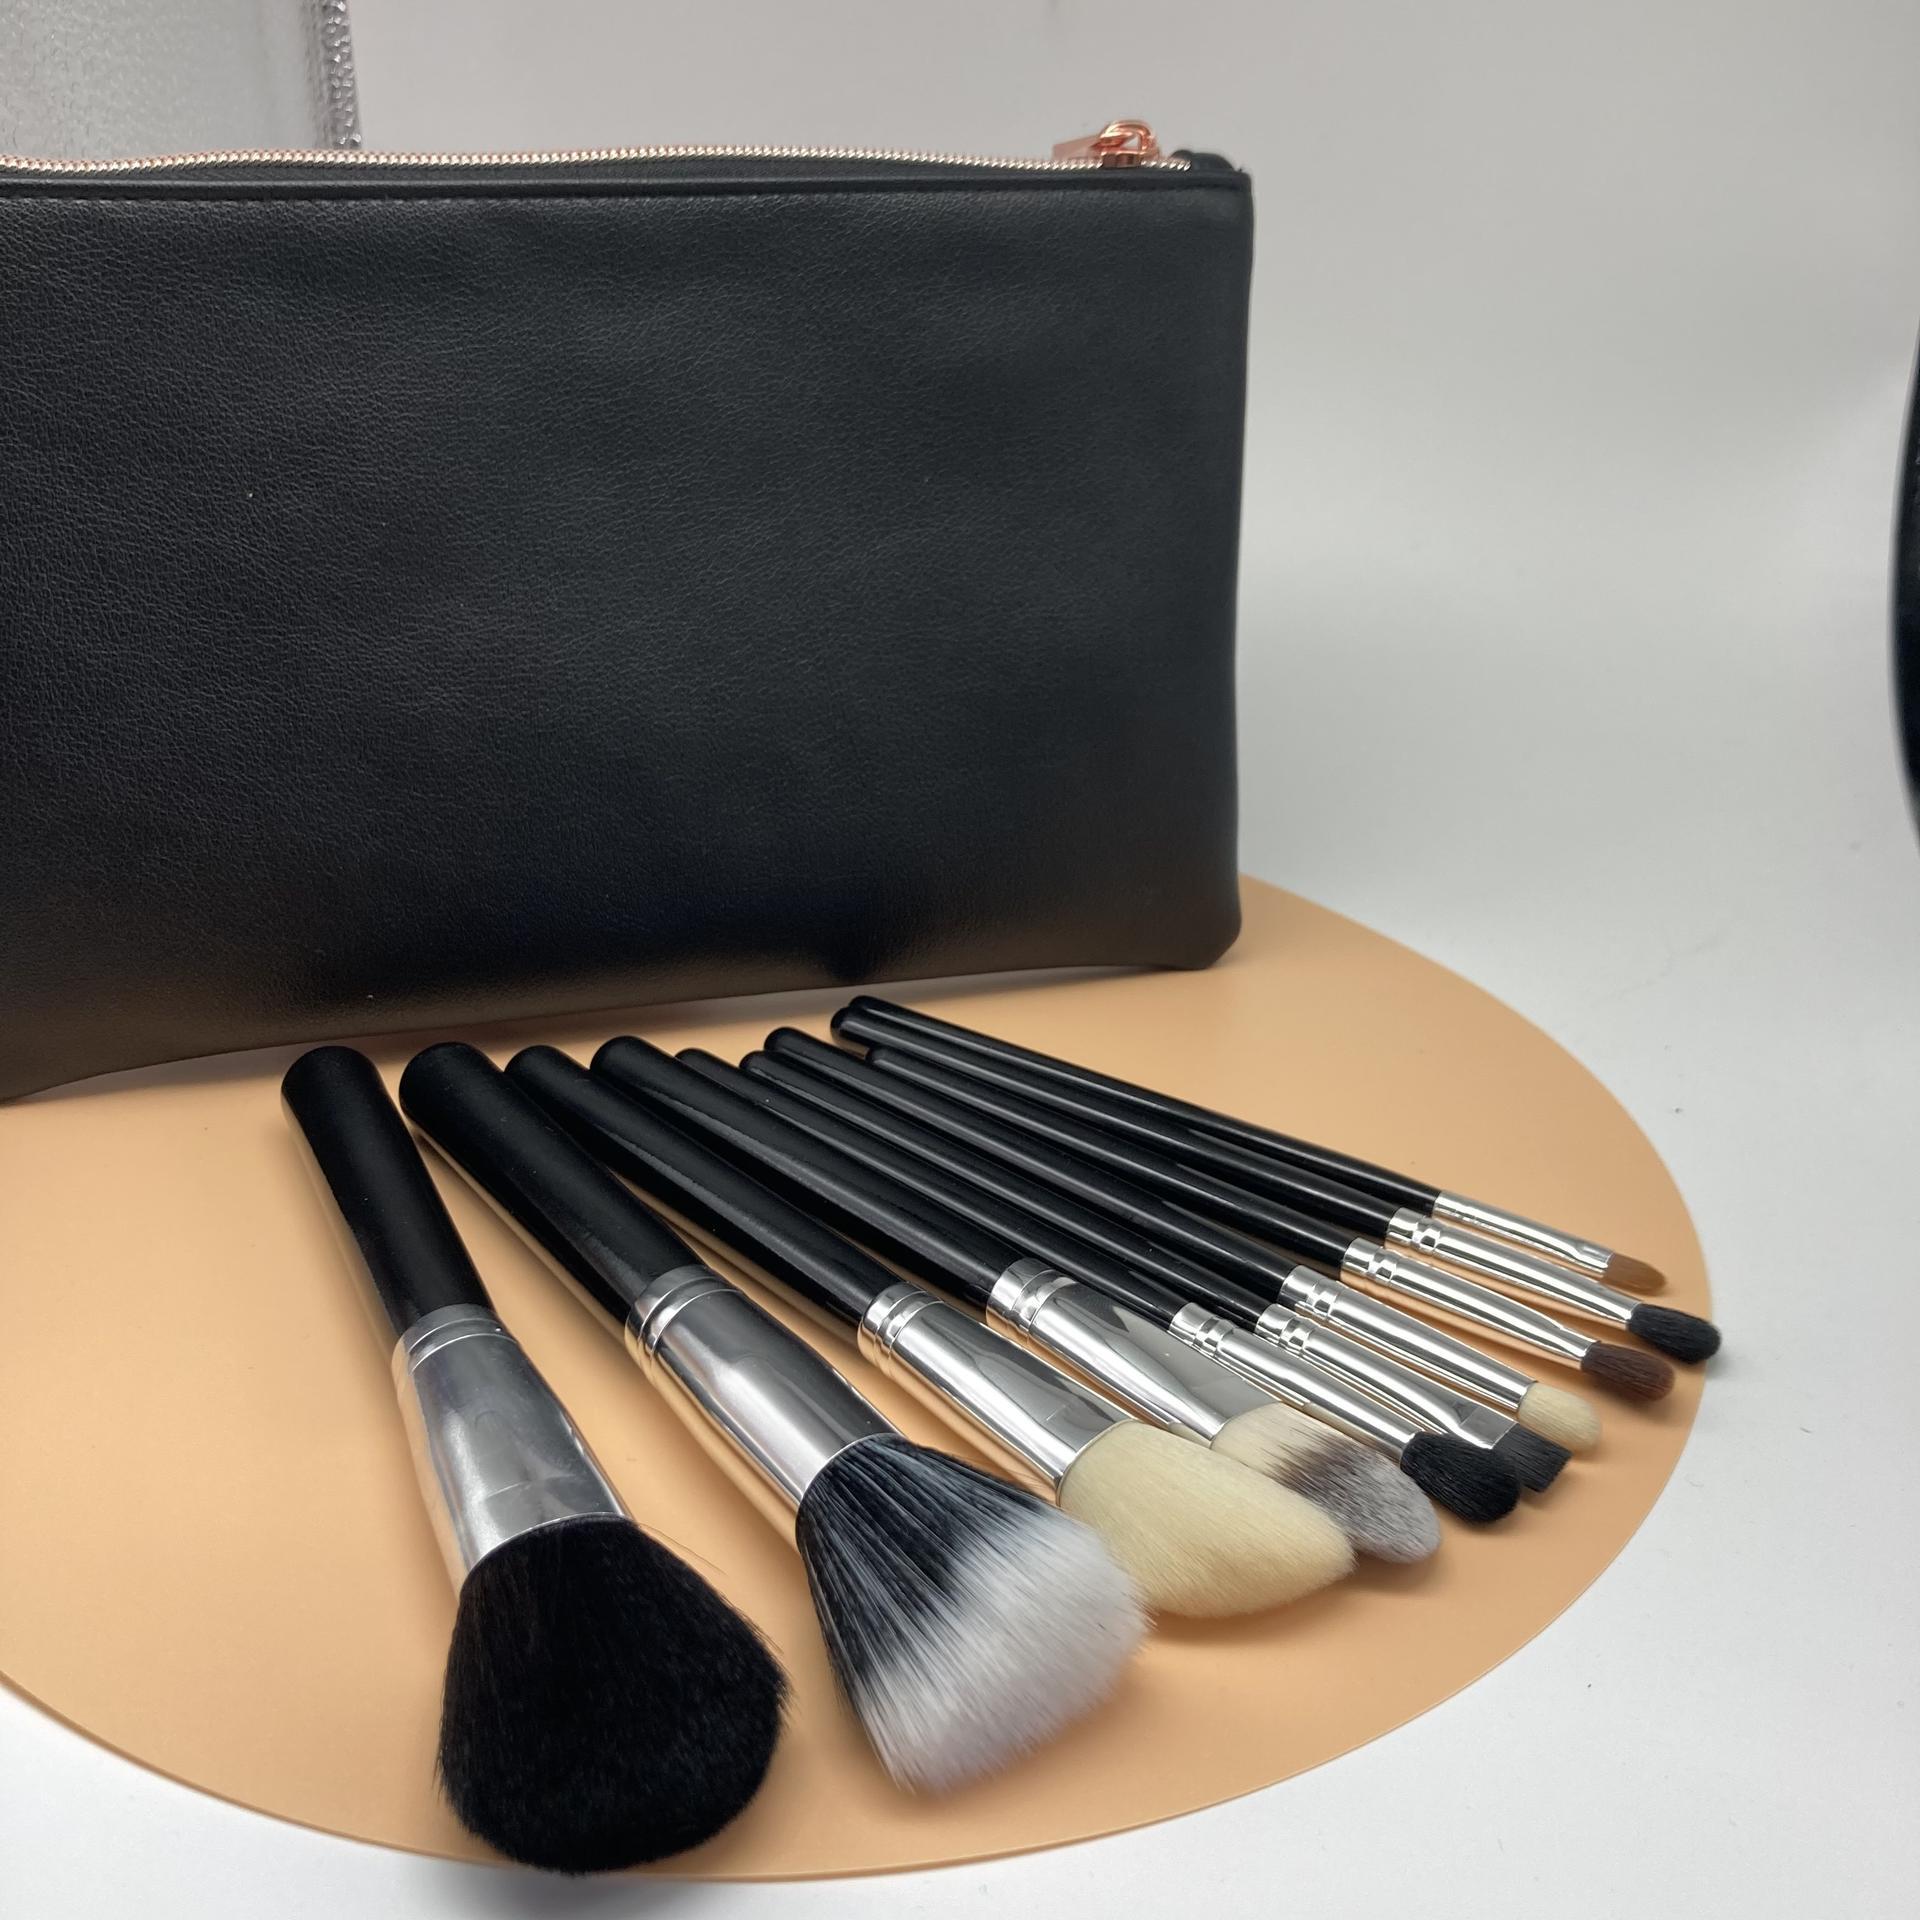 Brush set makeup kit 10pcs suprabeautyprivate label makeup brushes set custom makeup brush